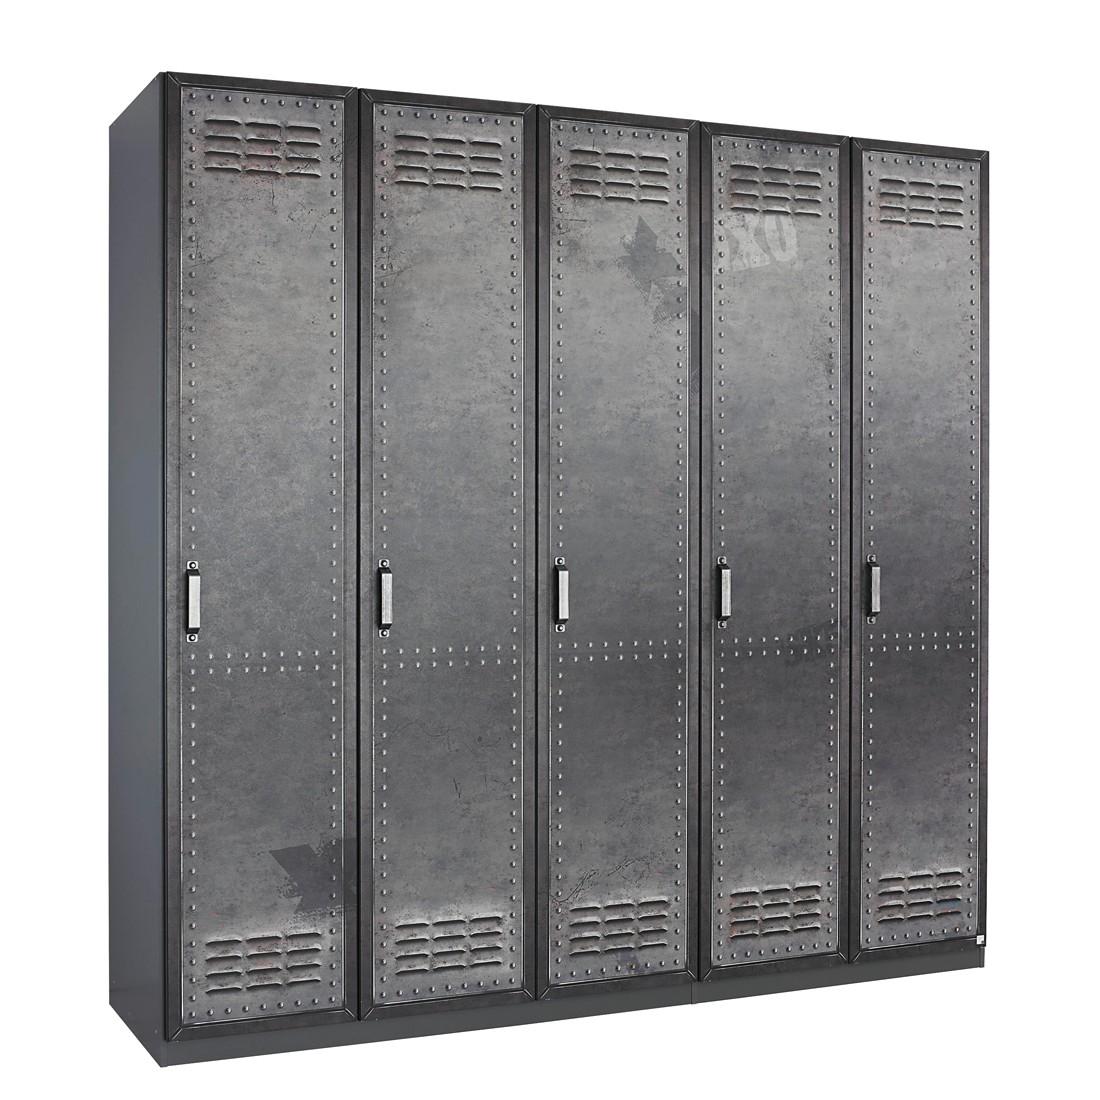 Draaideurkast Workbase - industrial print look/grafietkleurig - 225cm (5-deurs) - scharnieren rechts, Rauch Select